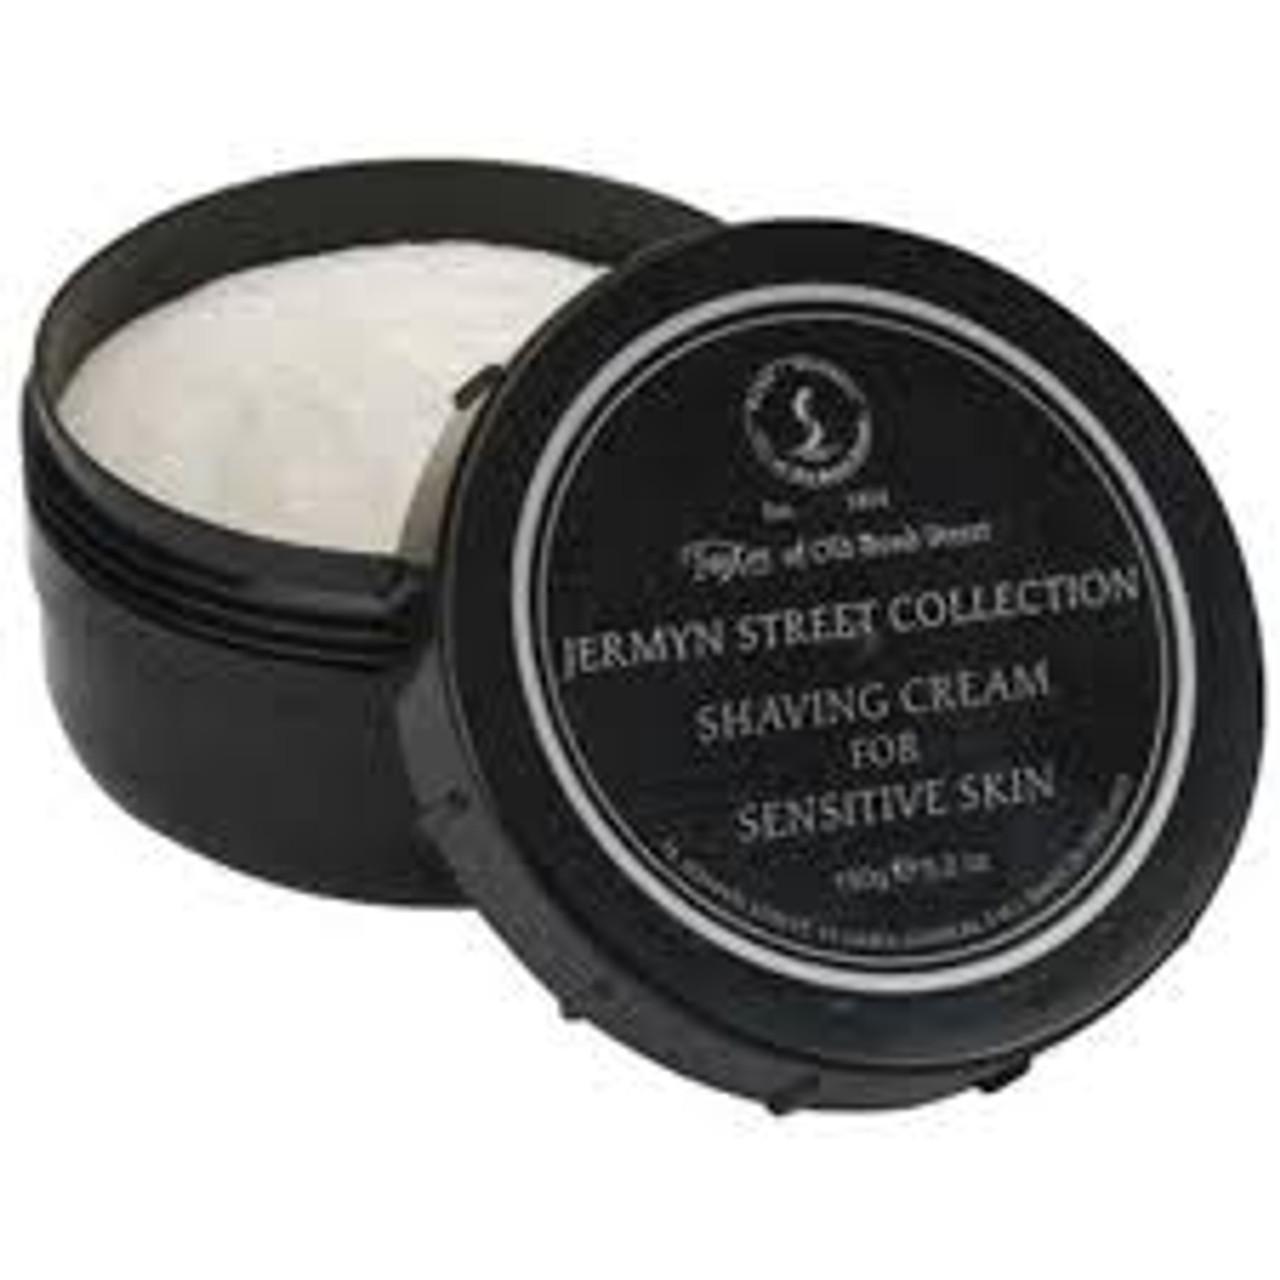 TOOB Jermyn Street Shave Cream 5.3oz